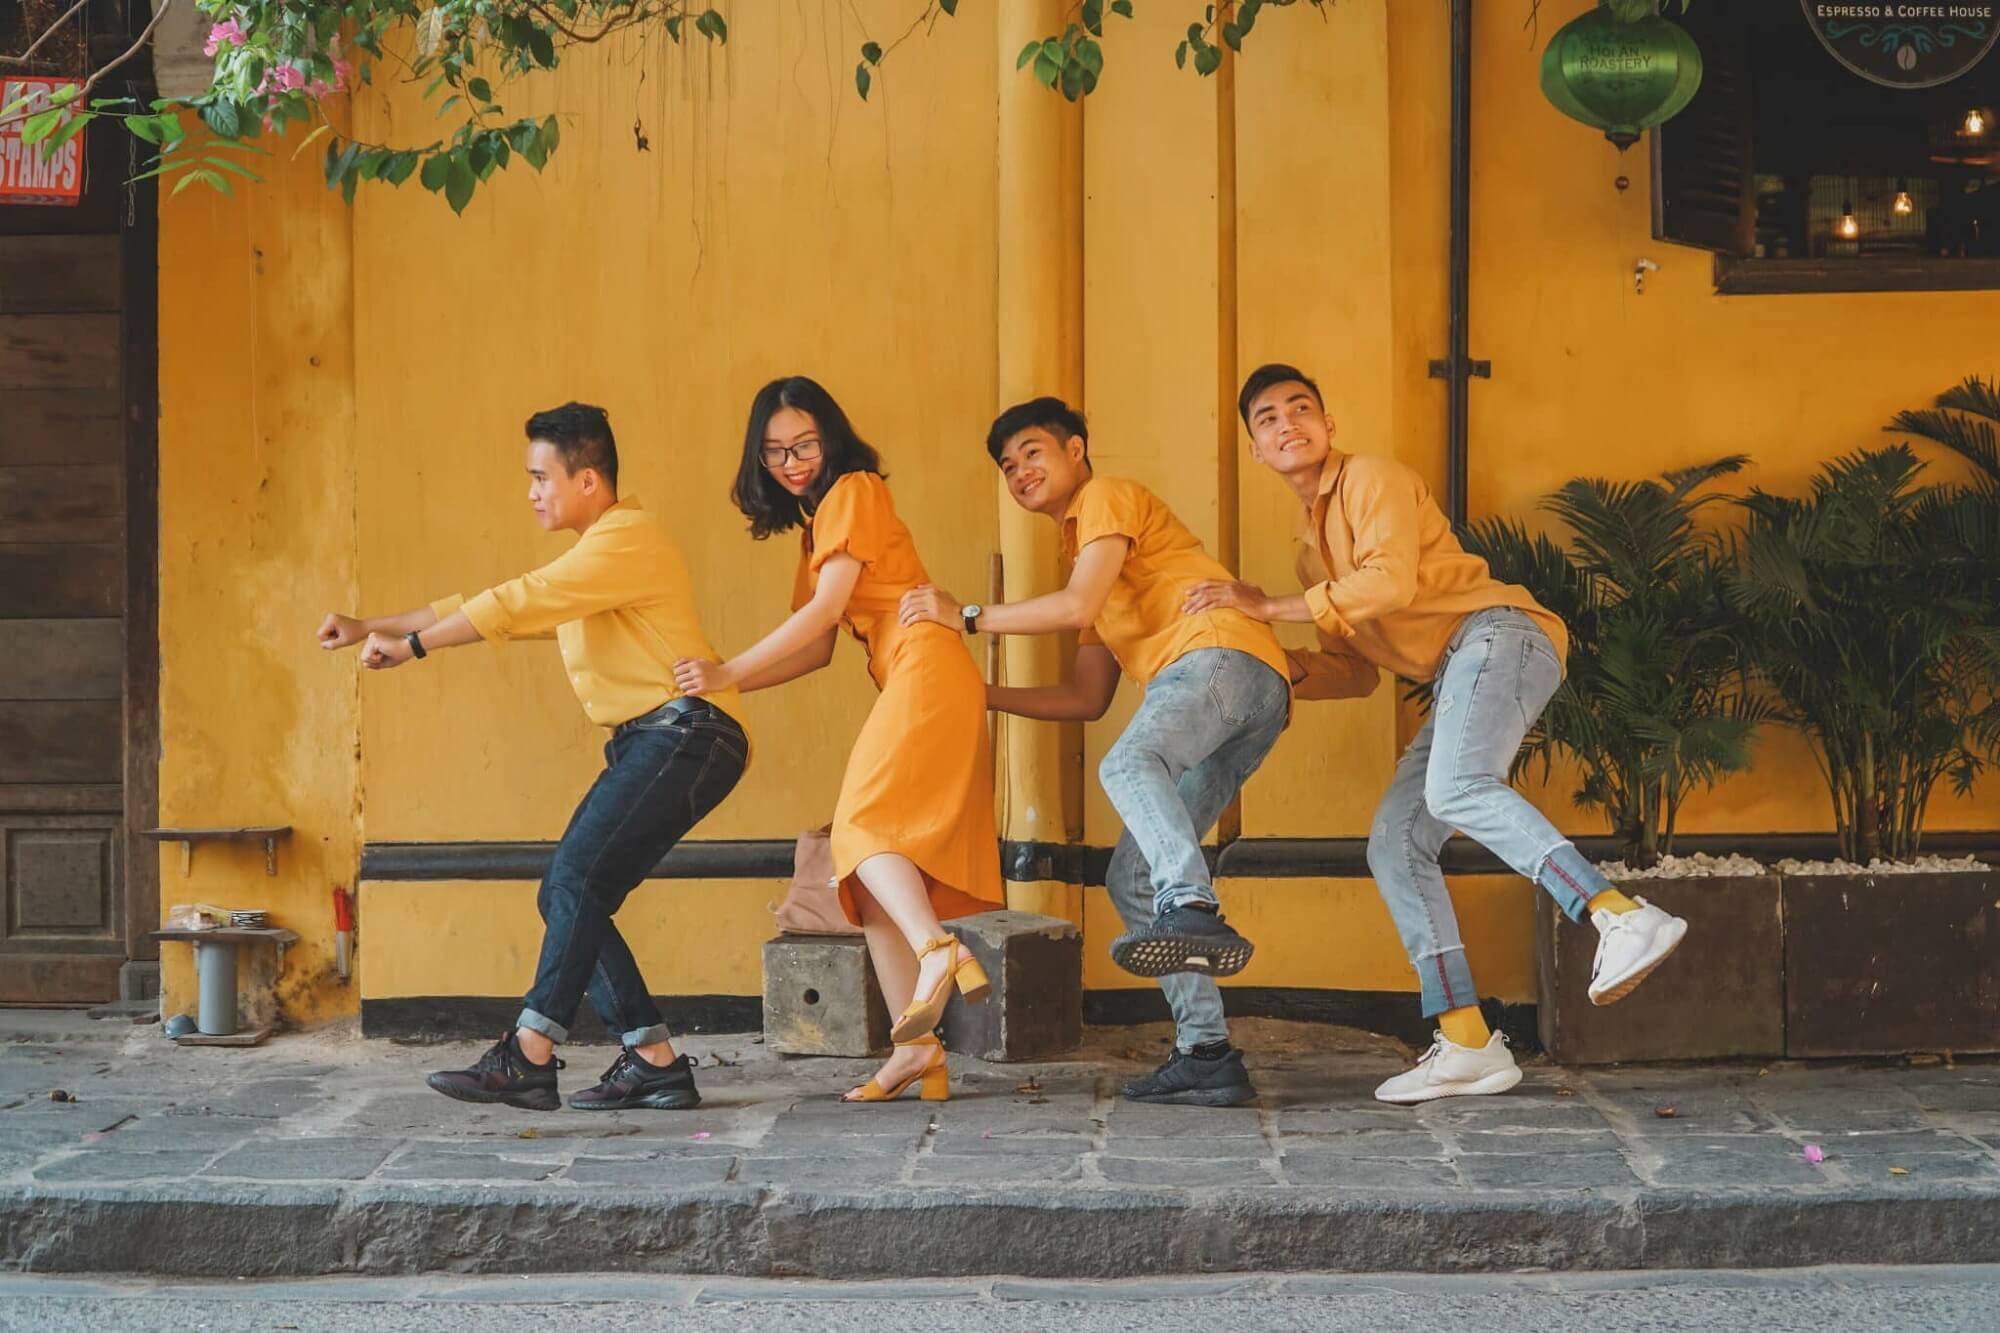 5n4d Cung Hoi Ban Cang Quet Da Nang Quang Nam Pho Coi Hoi An 02